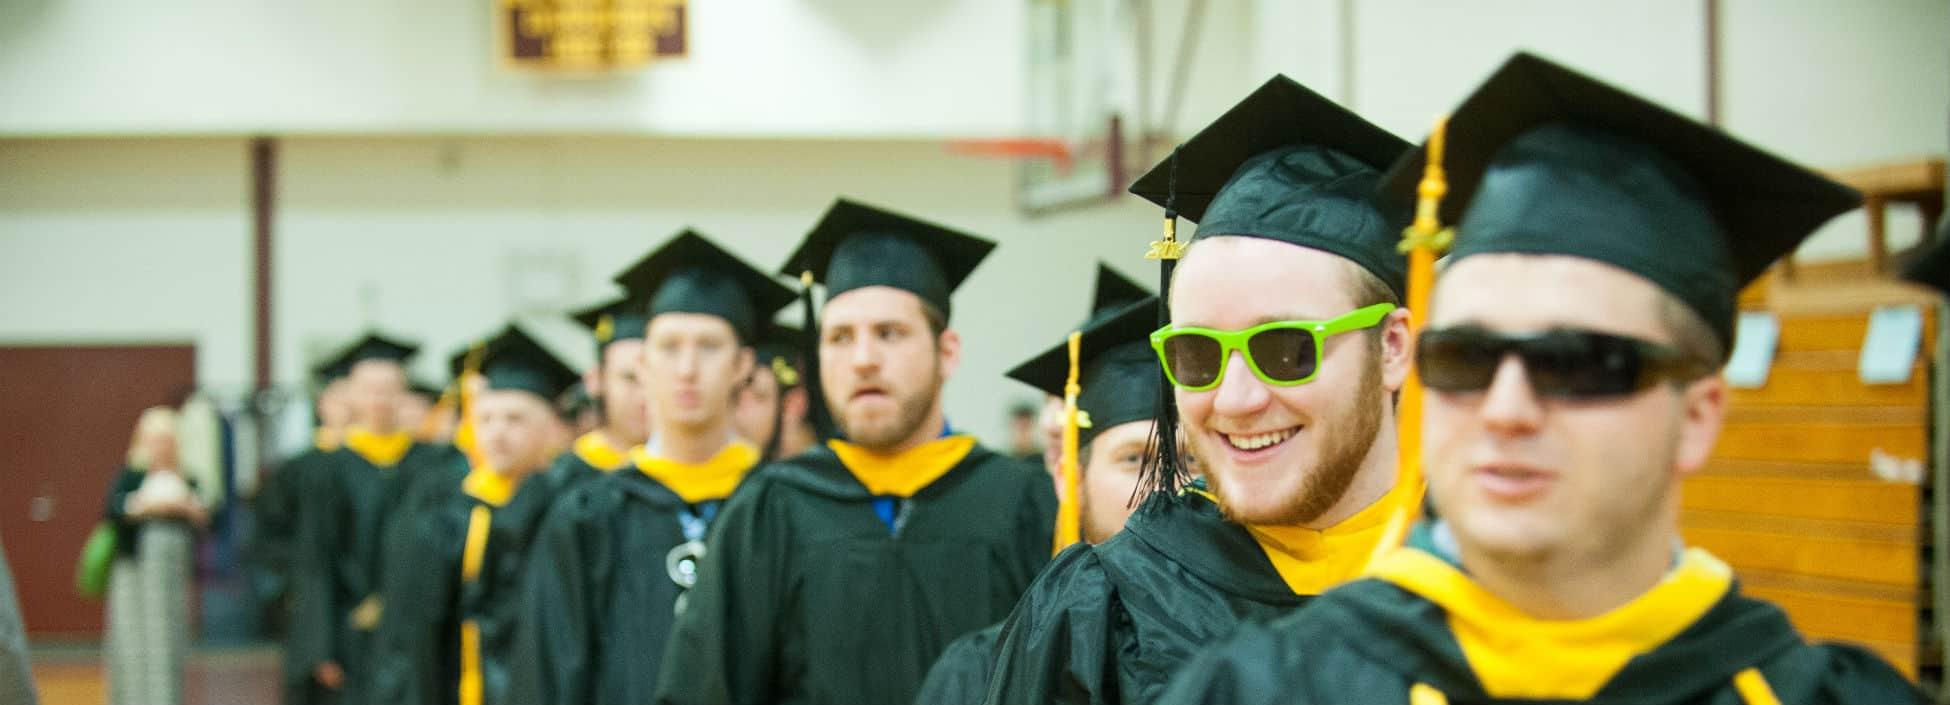 Graduates lining up for commencement, graduation, smiling, sunglasses, happy